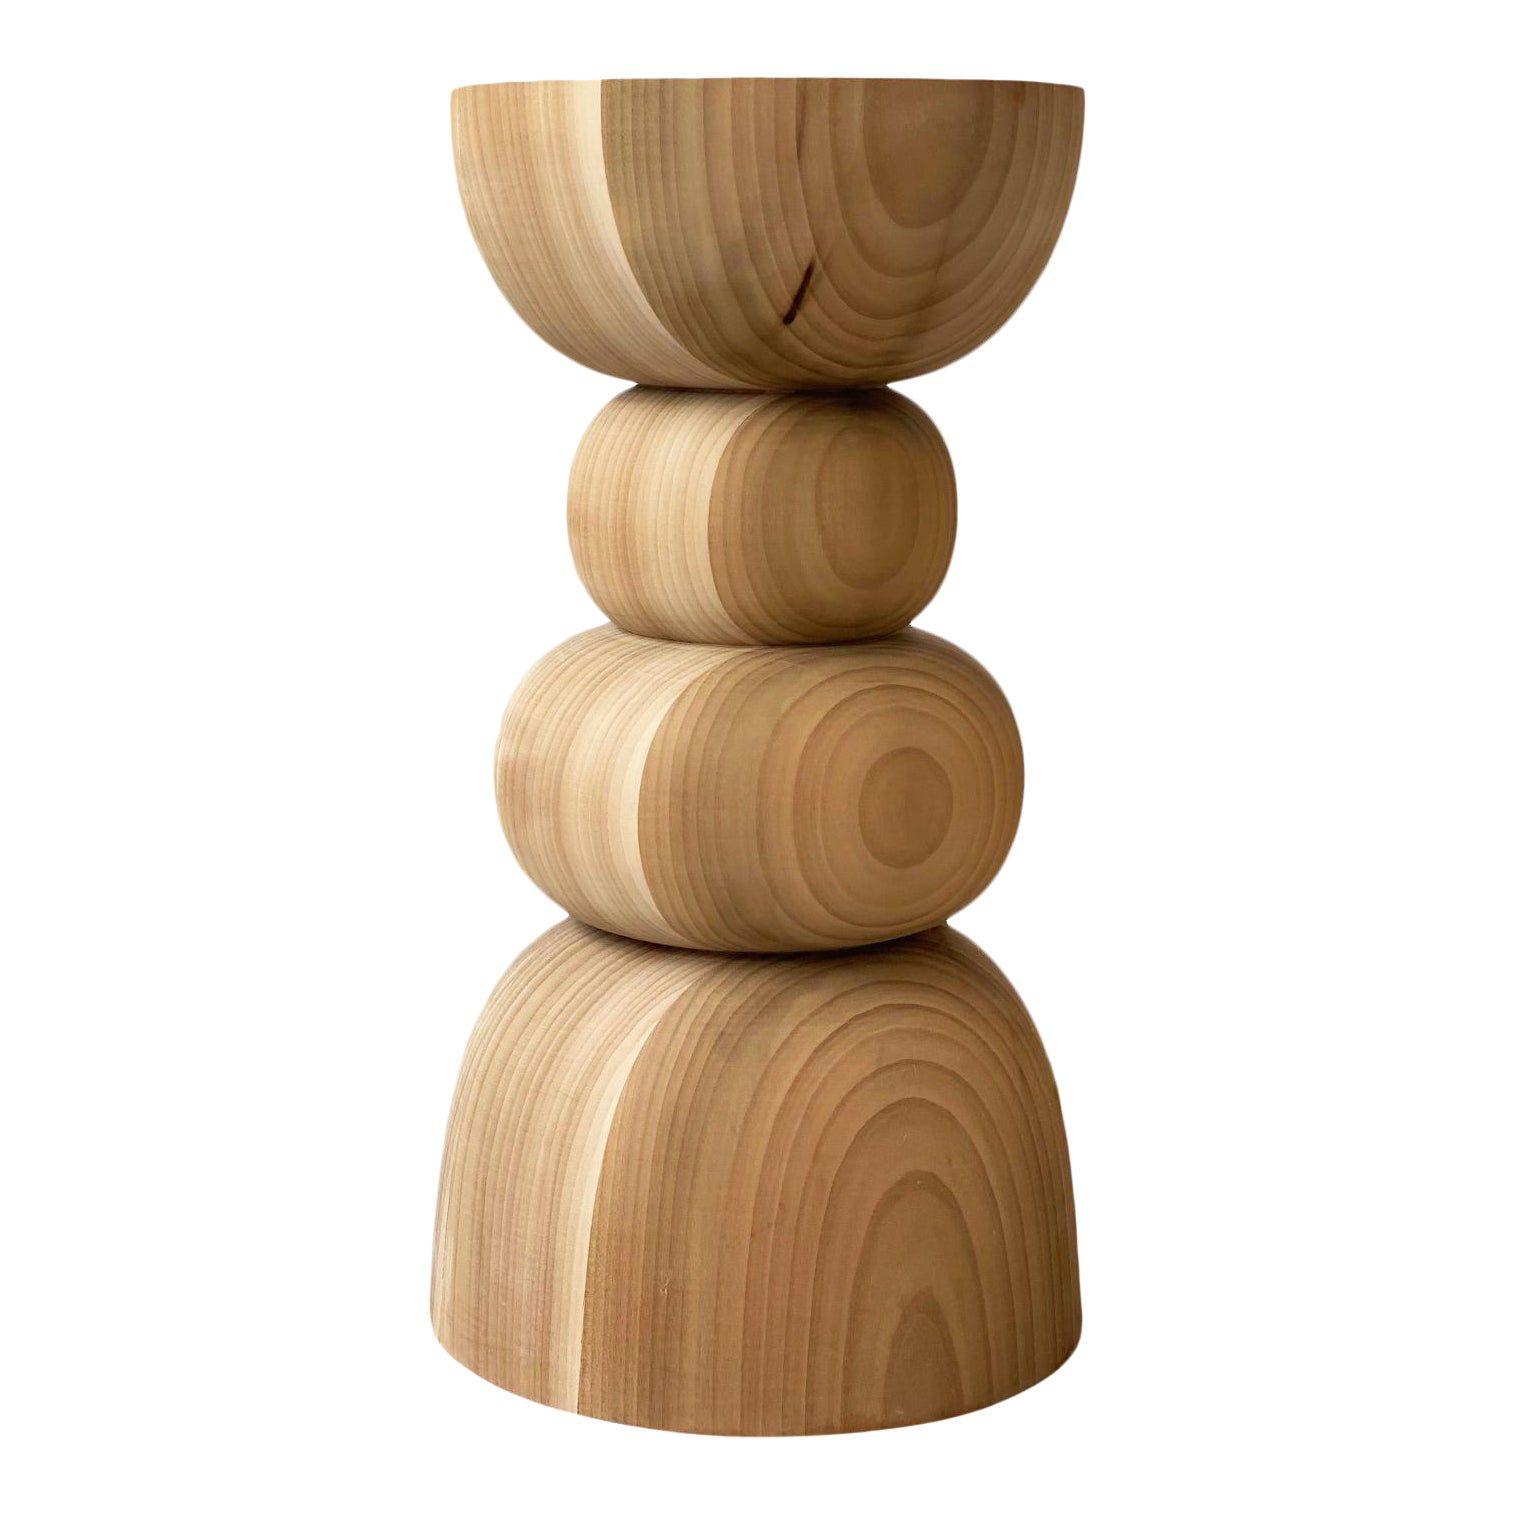 Geometric Modern Wood Pedestal Table Wood Pedestal Modern Wood Pedestal Table